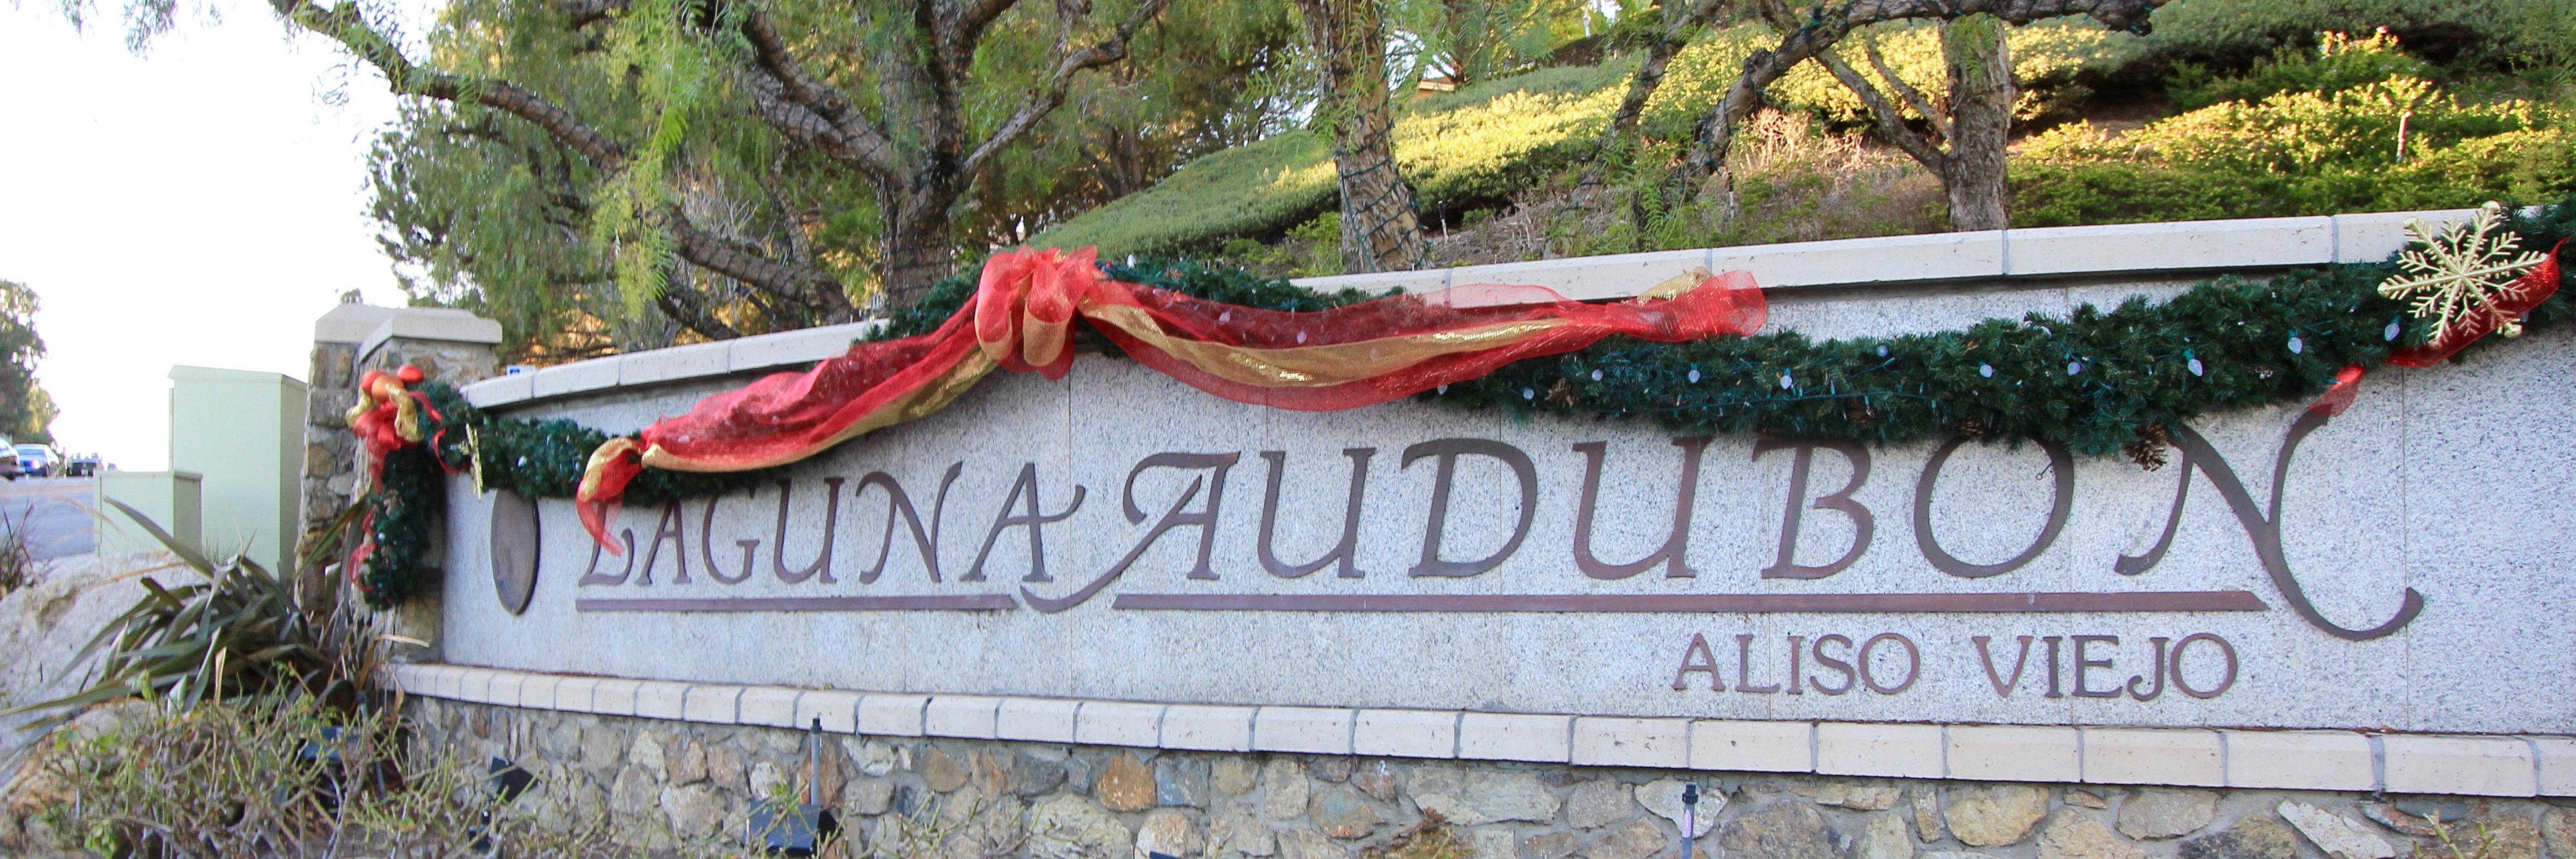 Laguna Audubon Community Marquee in Aliso Viejo Ca